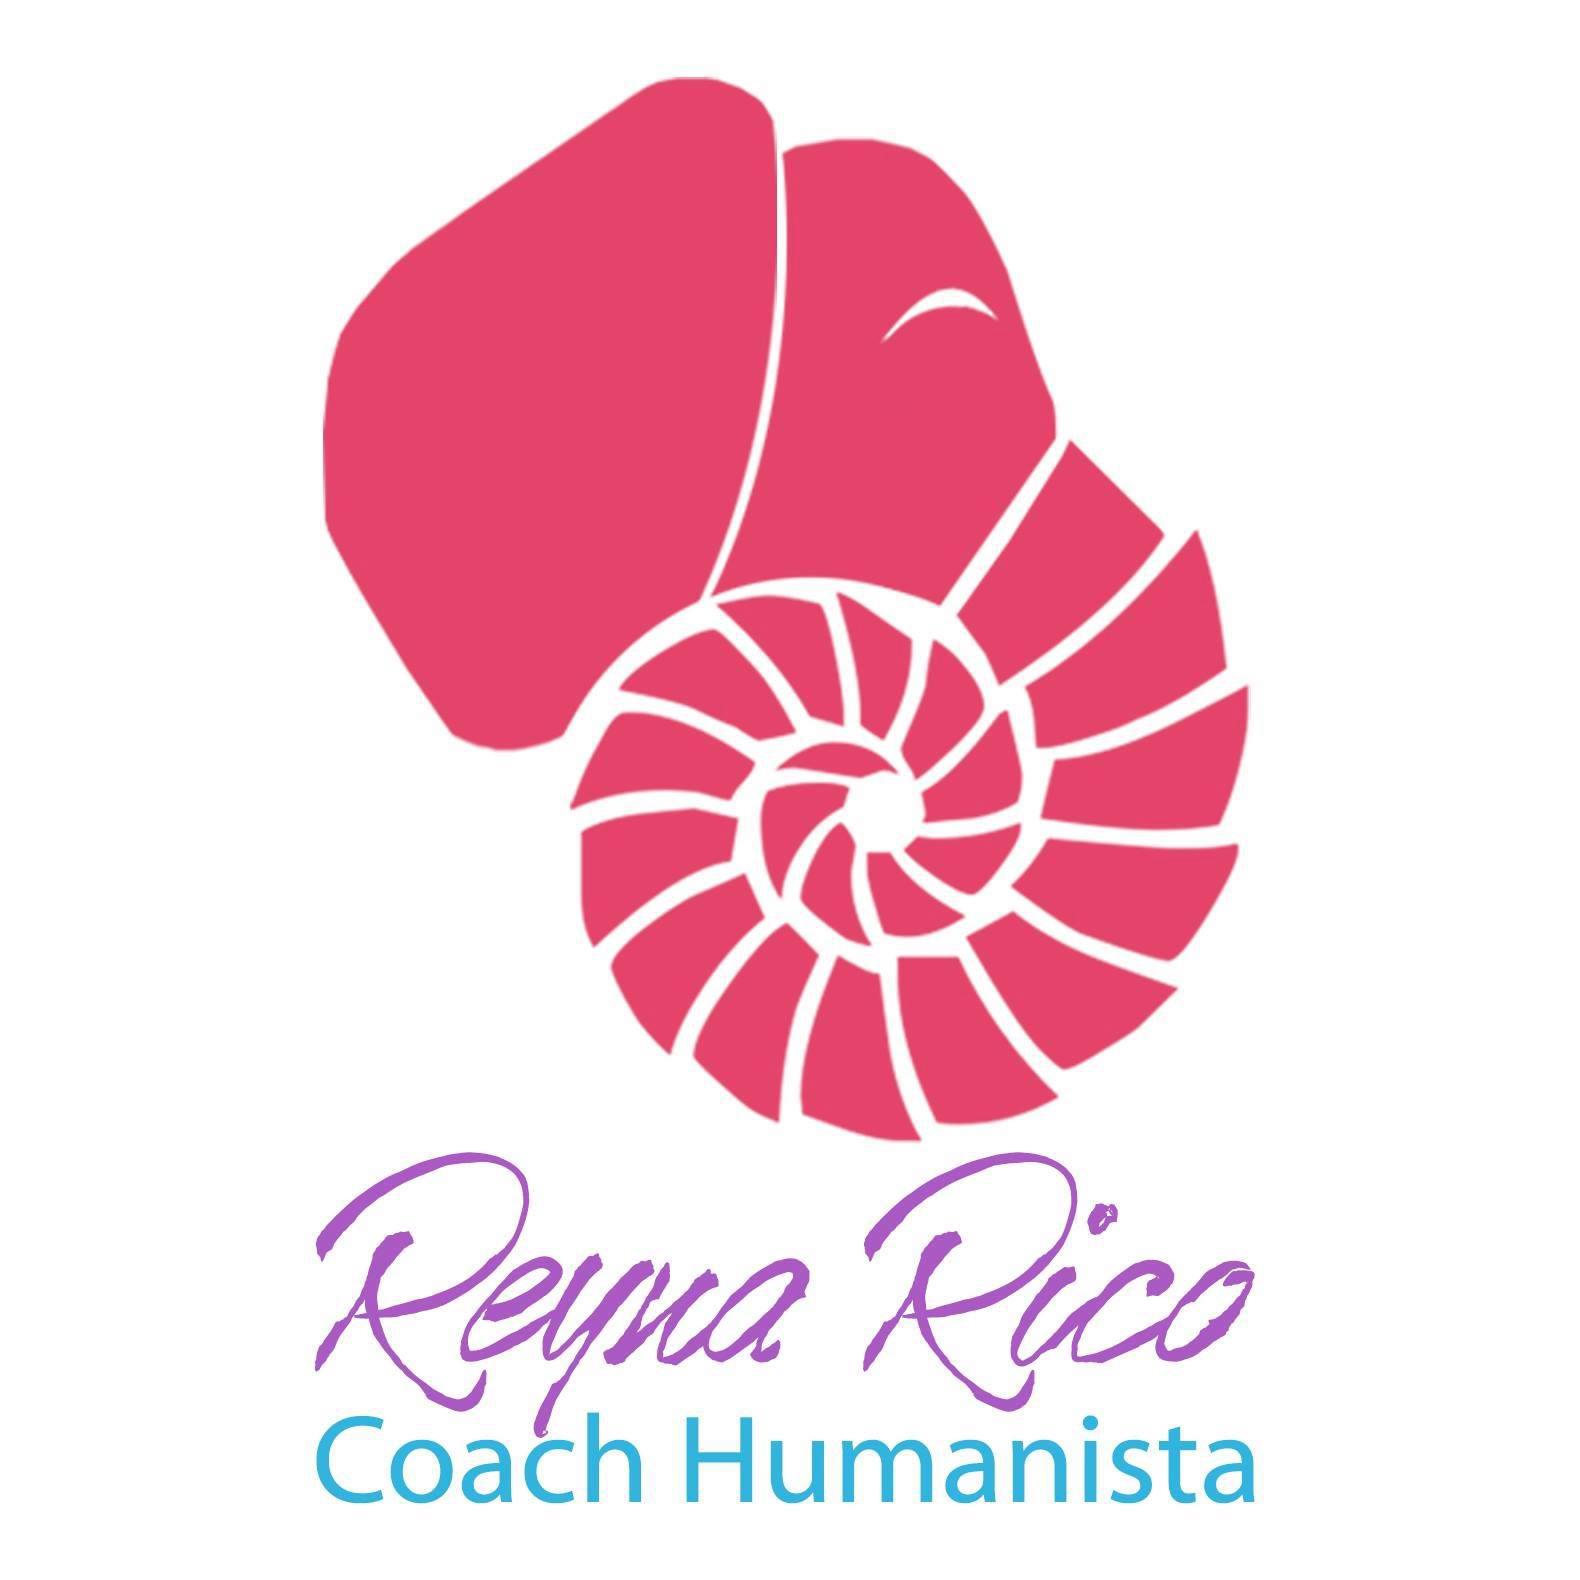 Rebeca Rico Coach